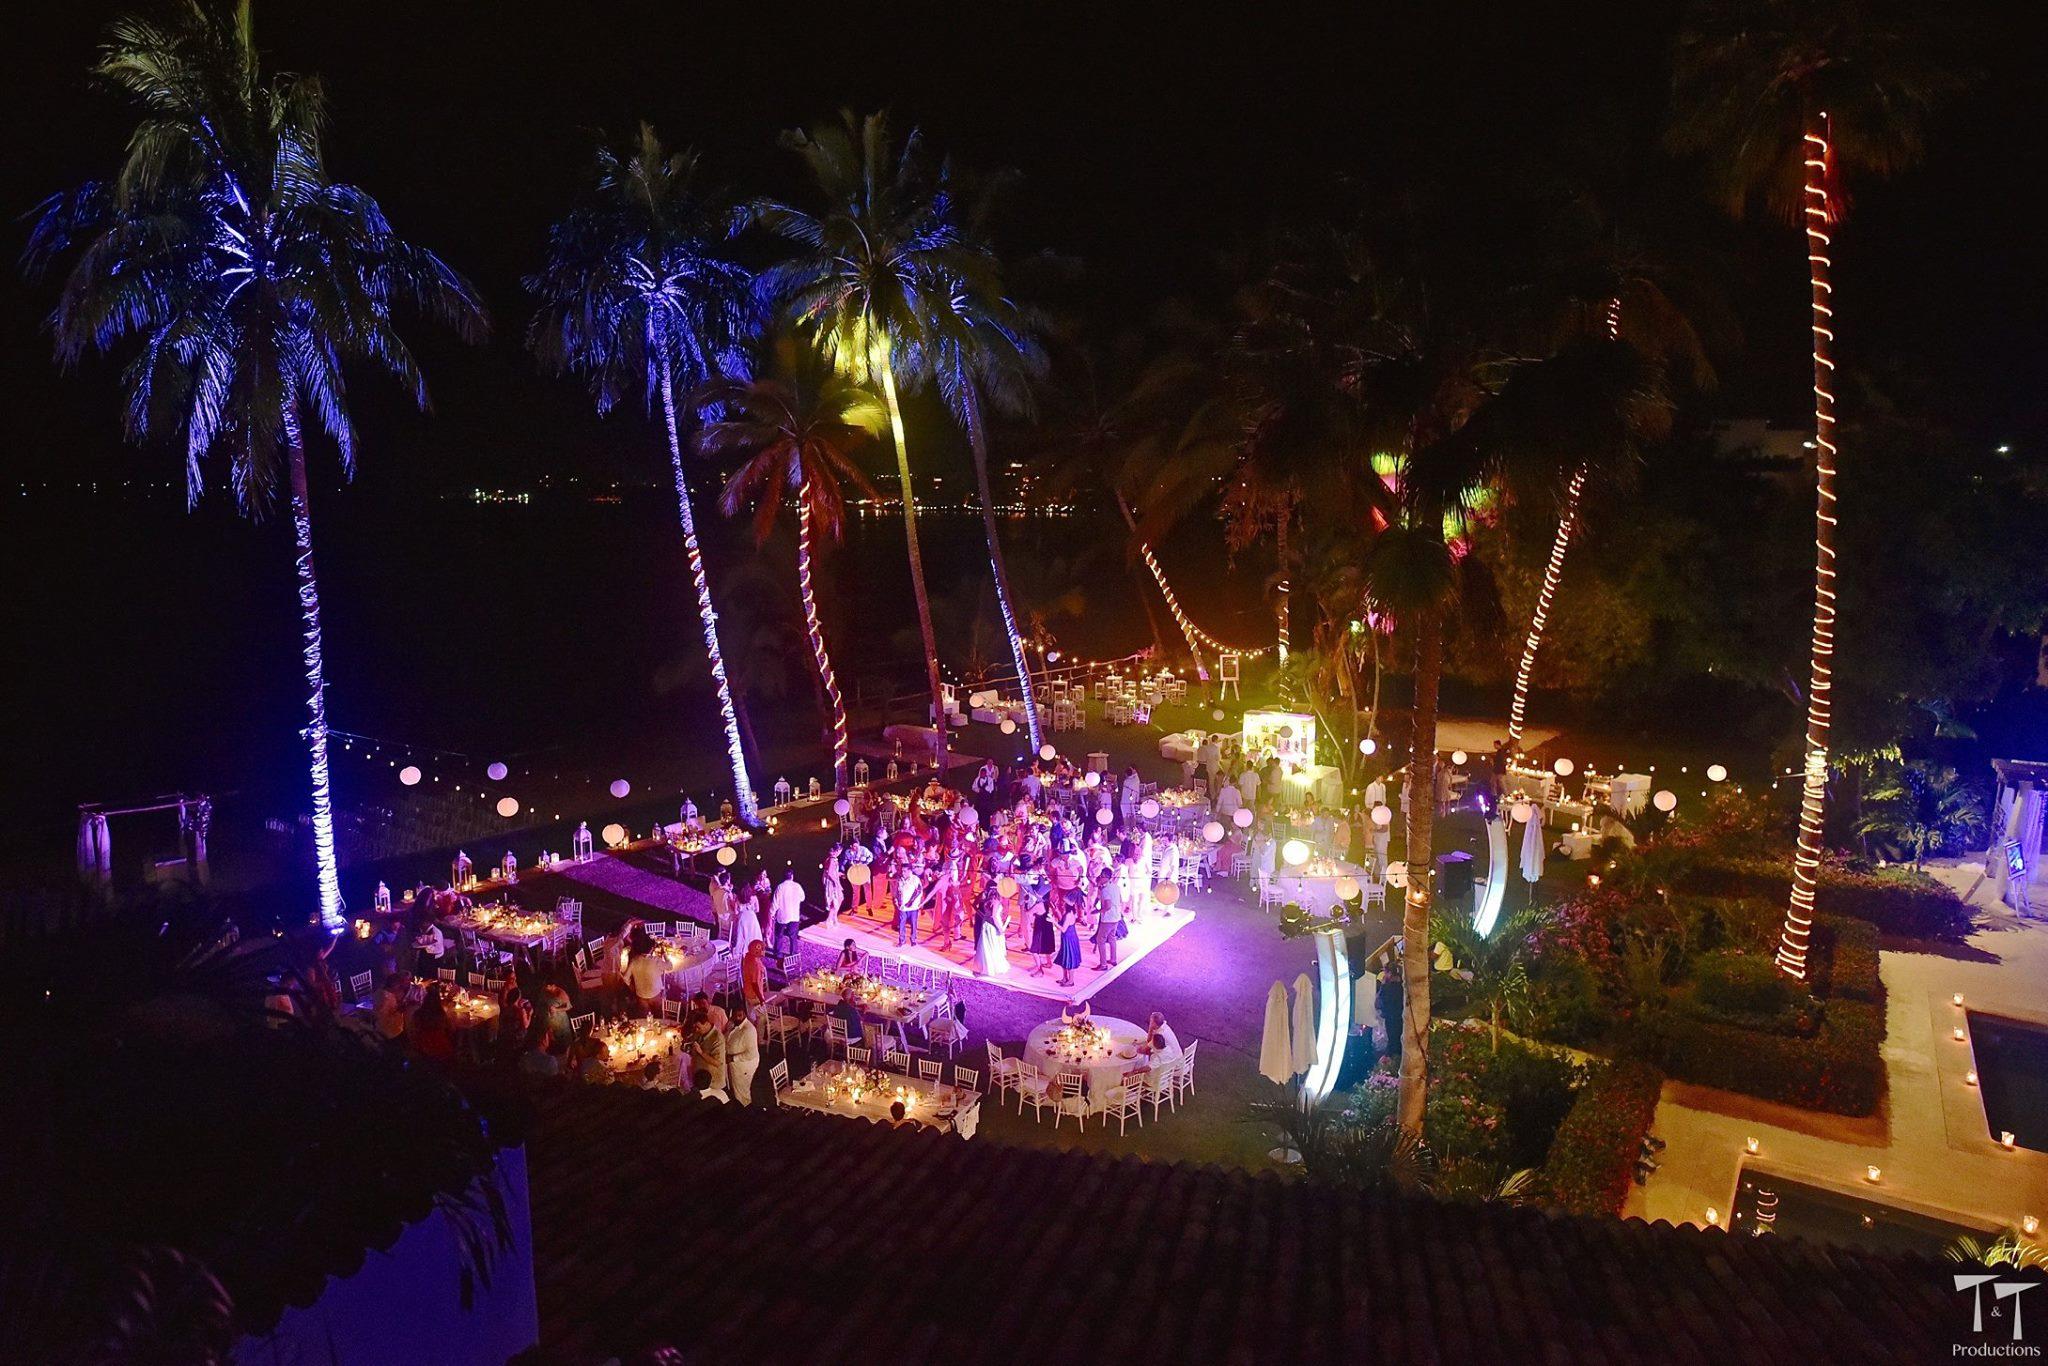 sayulita punta mita bucearais wedding venue large weddings welcome wedding planners